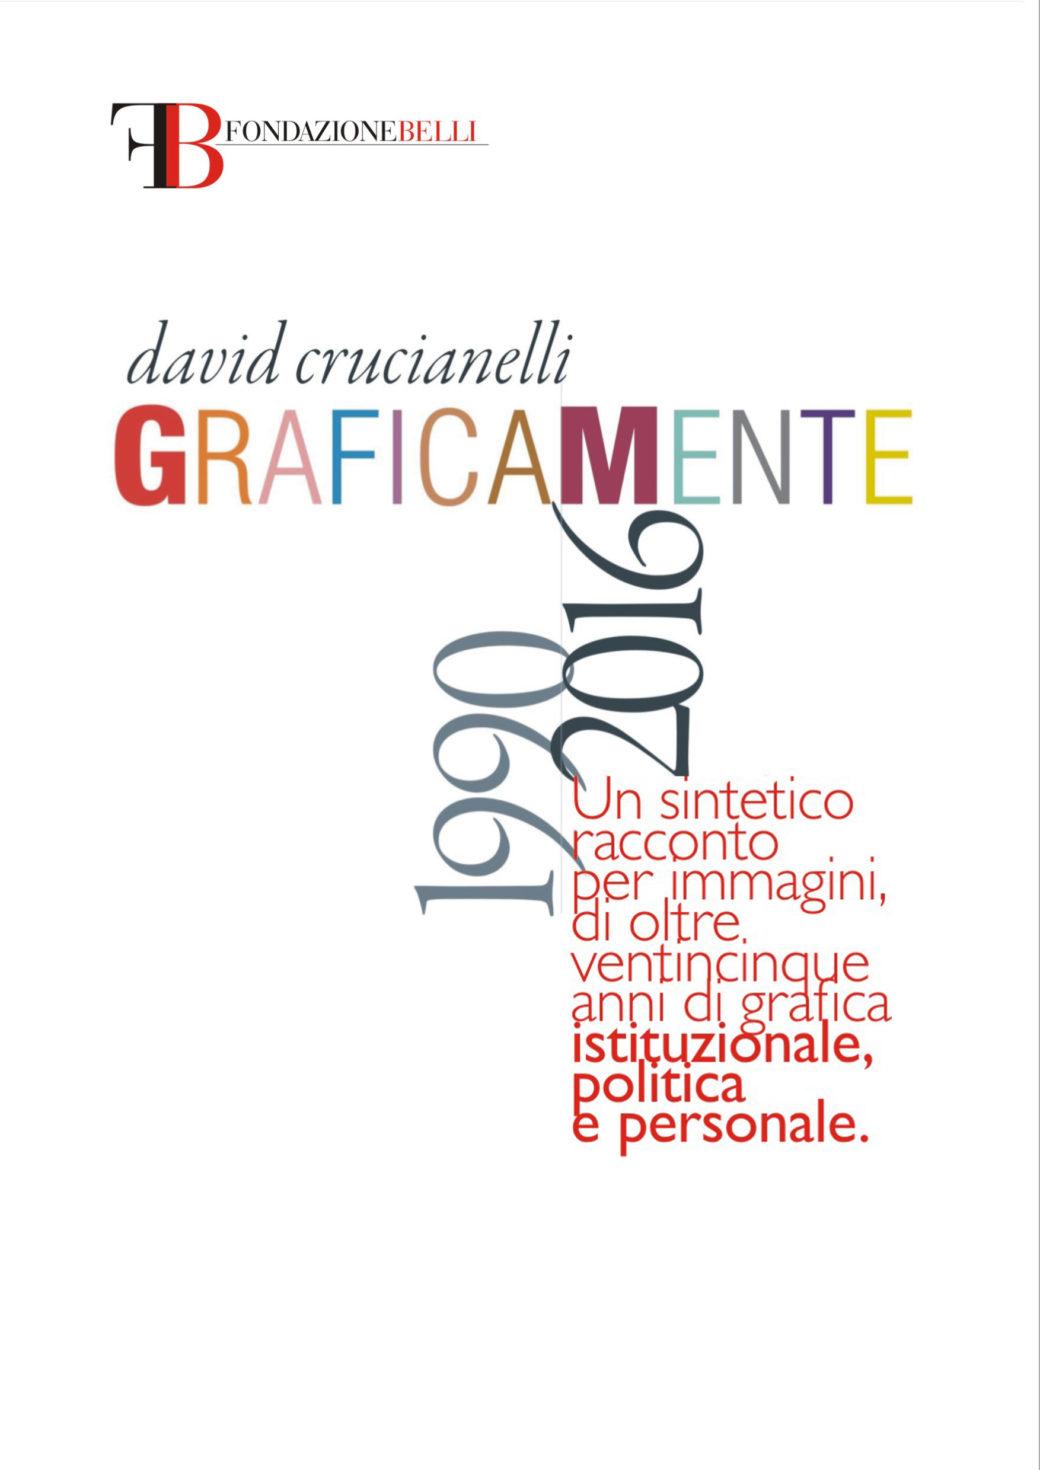 David Crucianelli